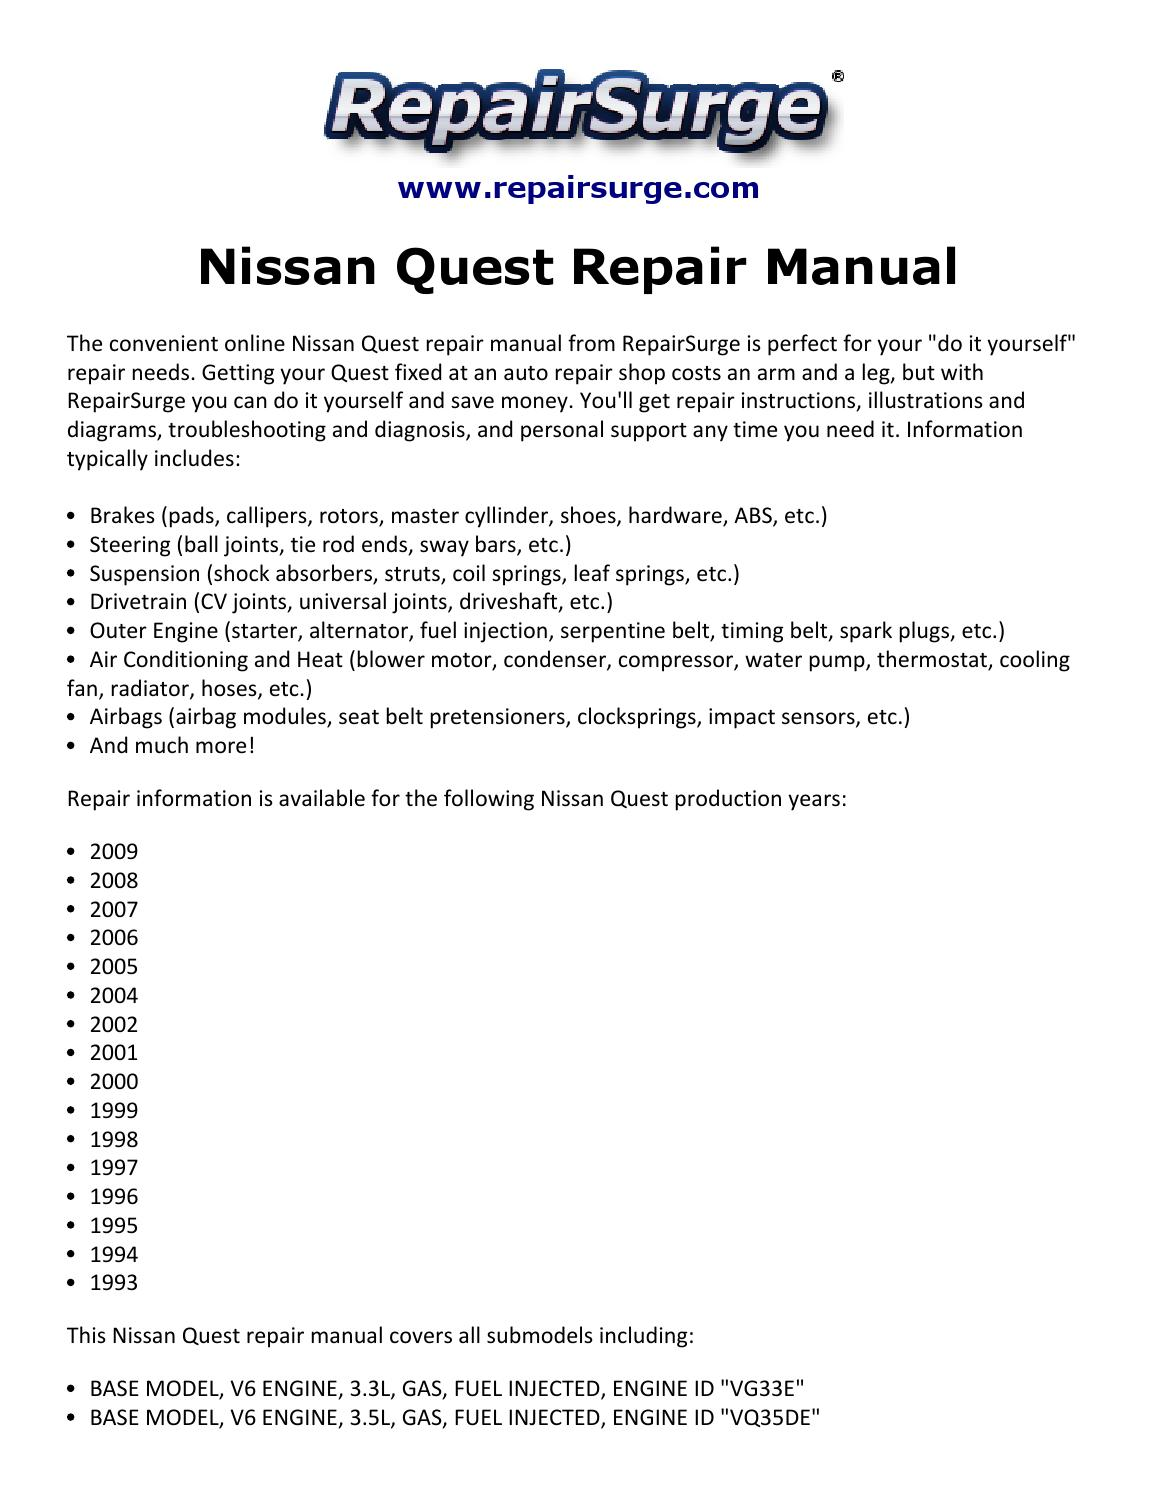 Nissan Quest Repair Manual 1993 2009 By Chris Bechard Issuu Vg30e Engine Diagram